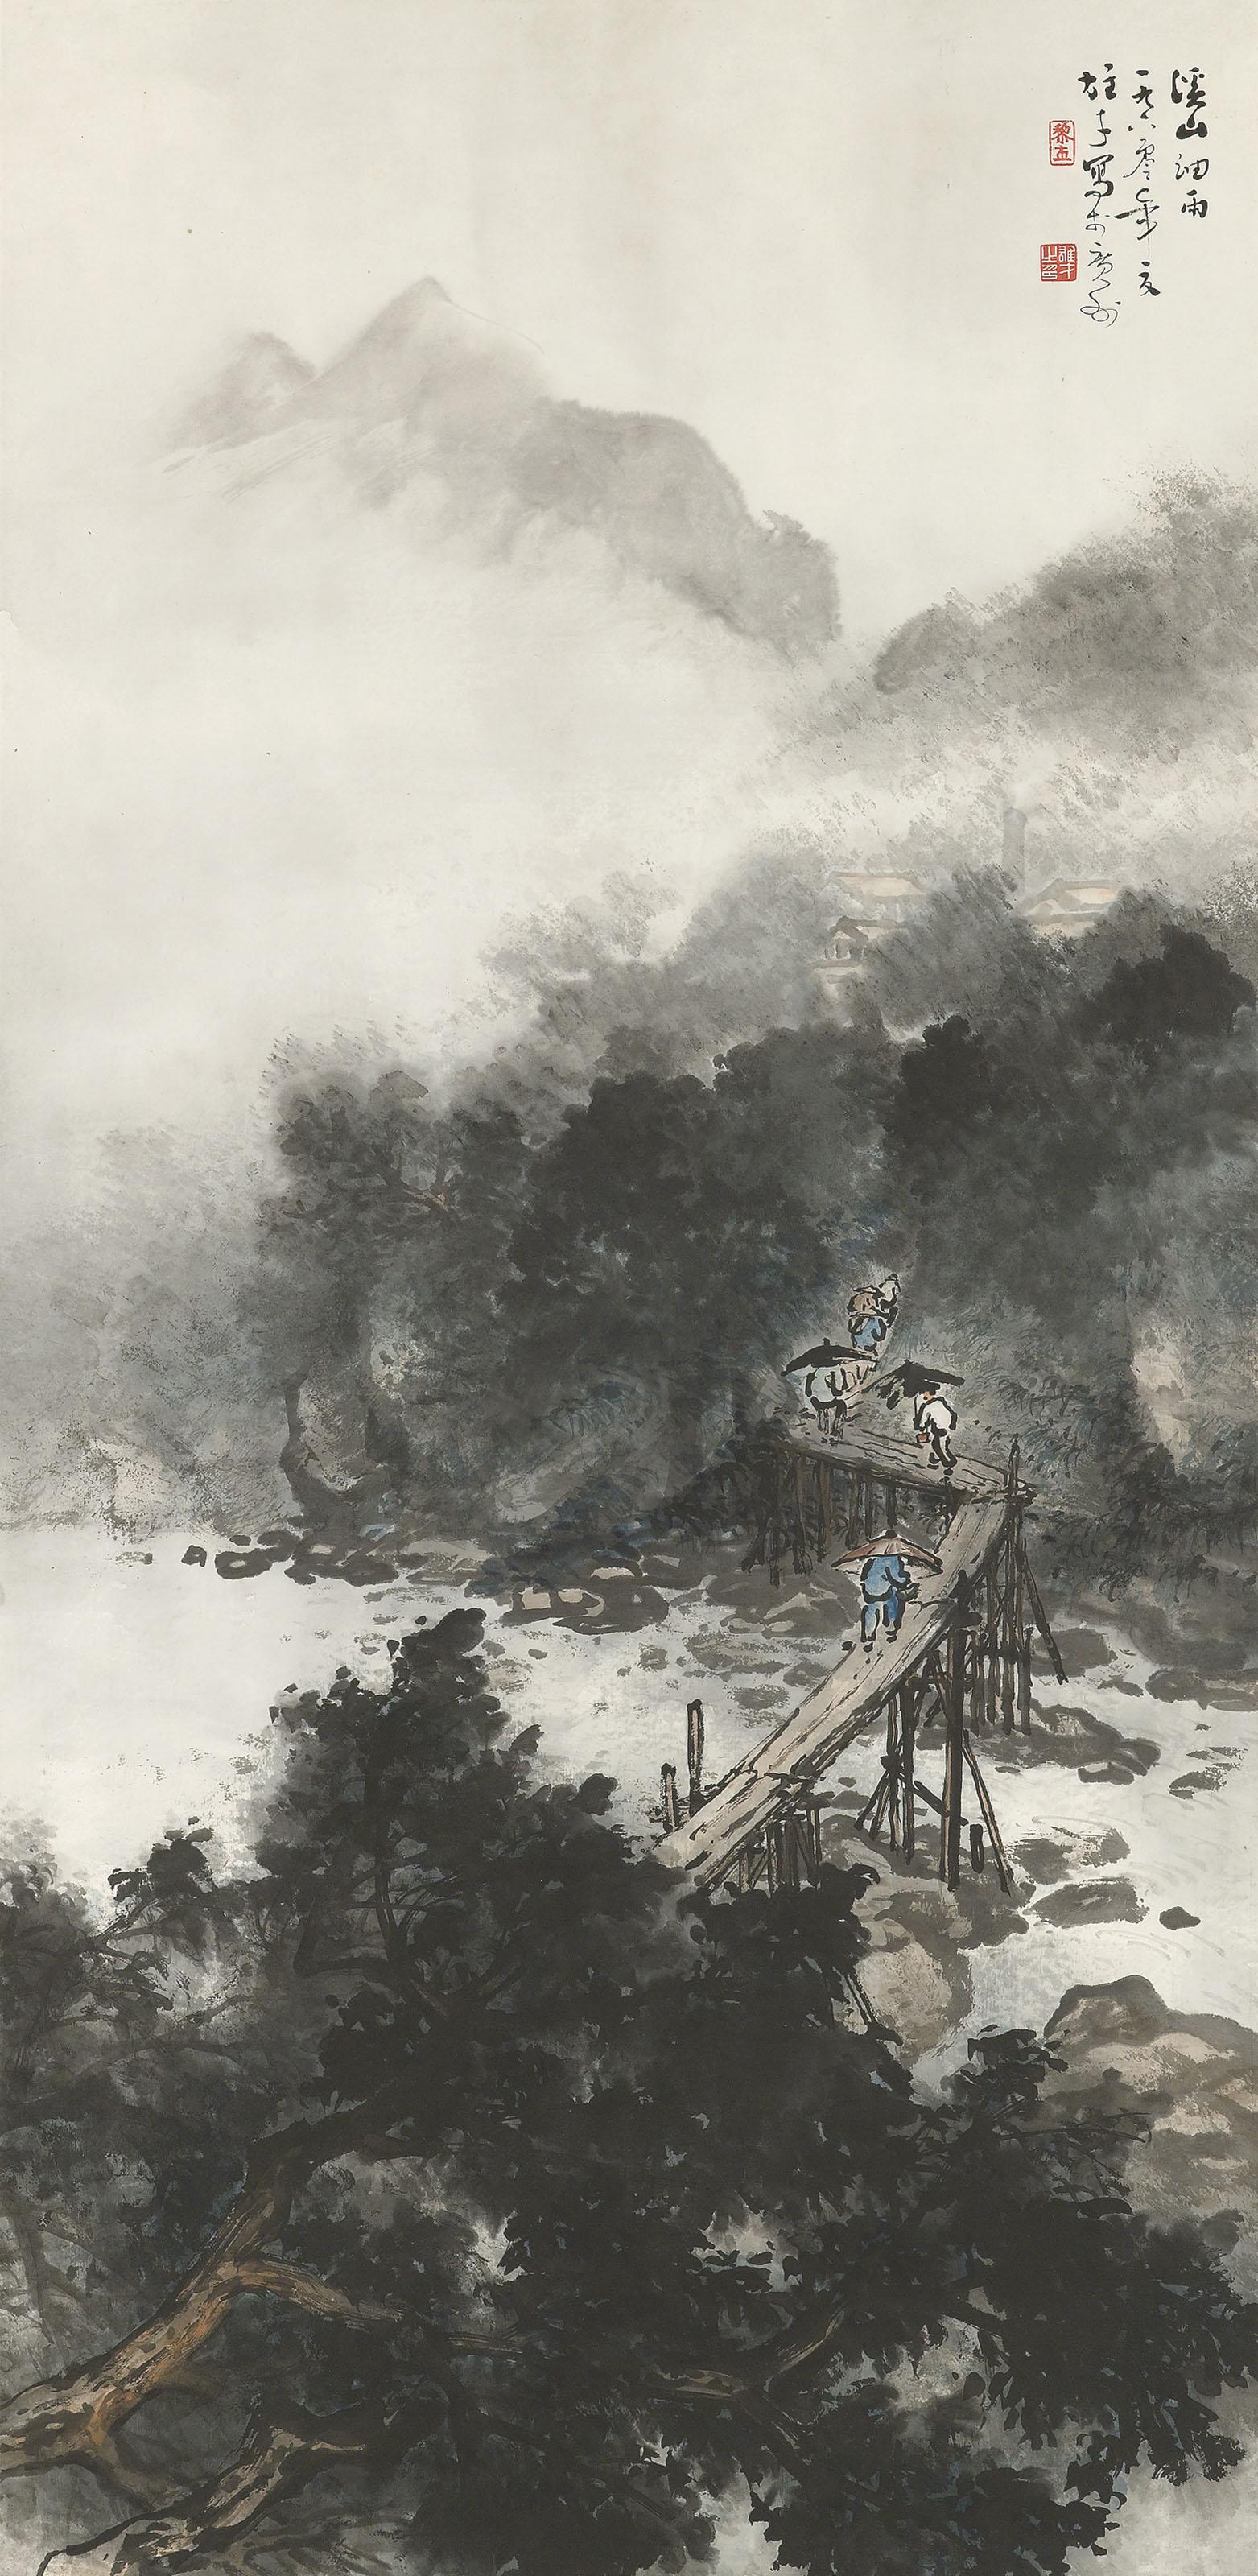 Mist Across the Stream